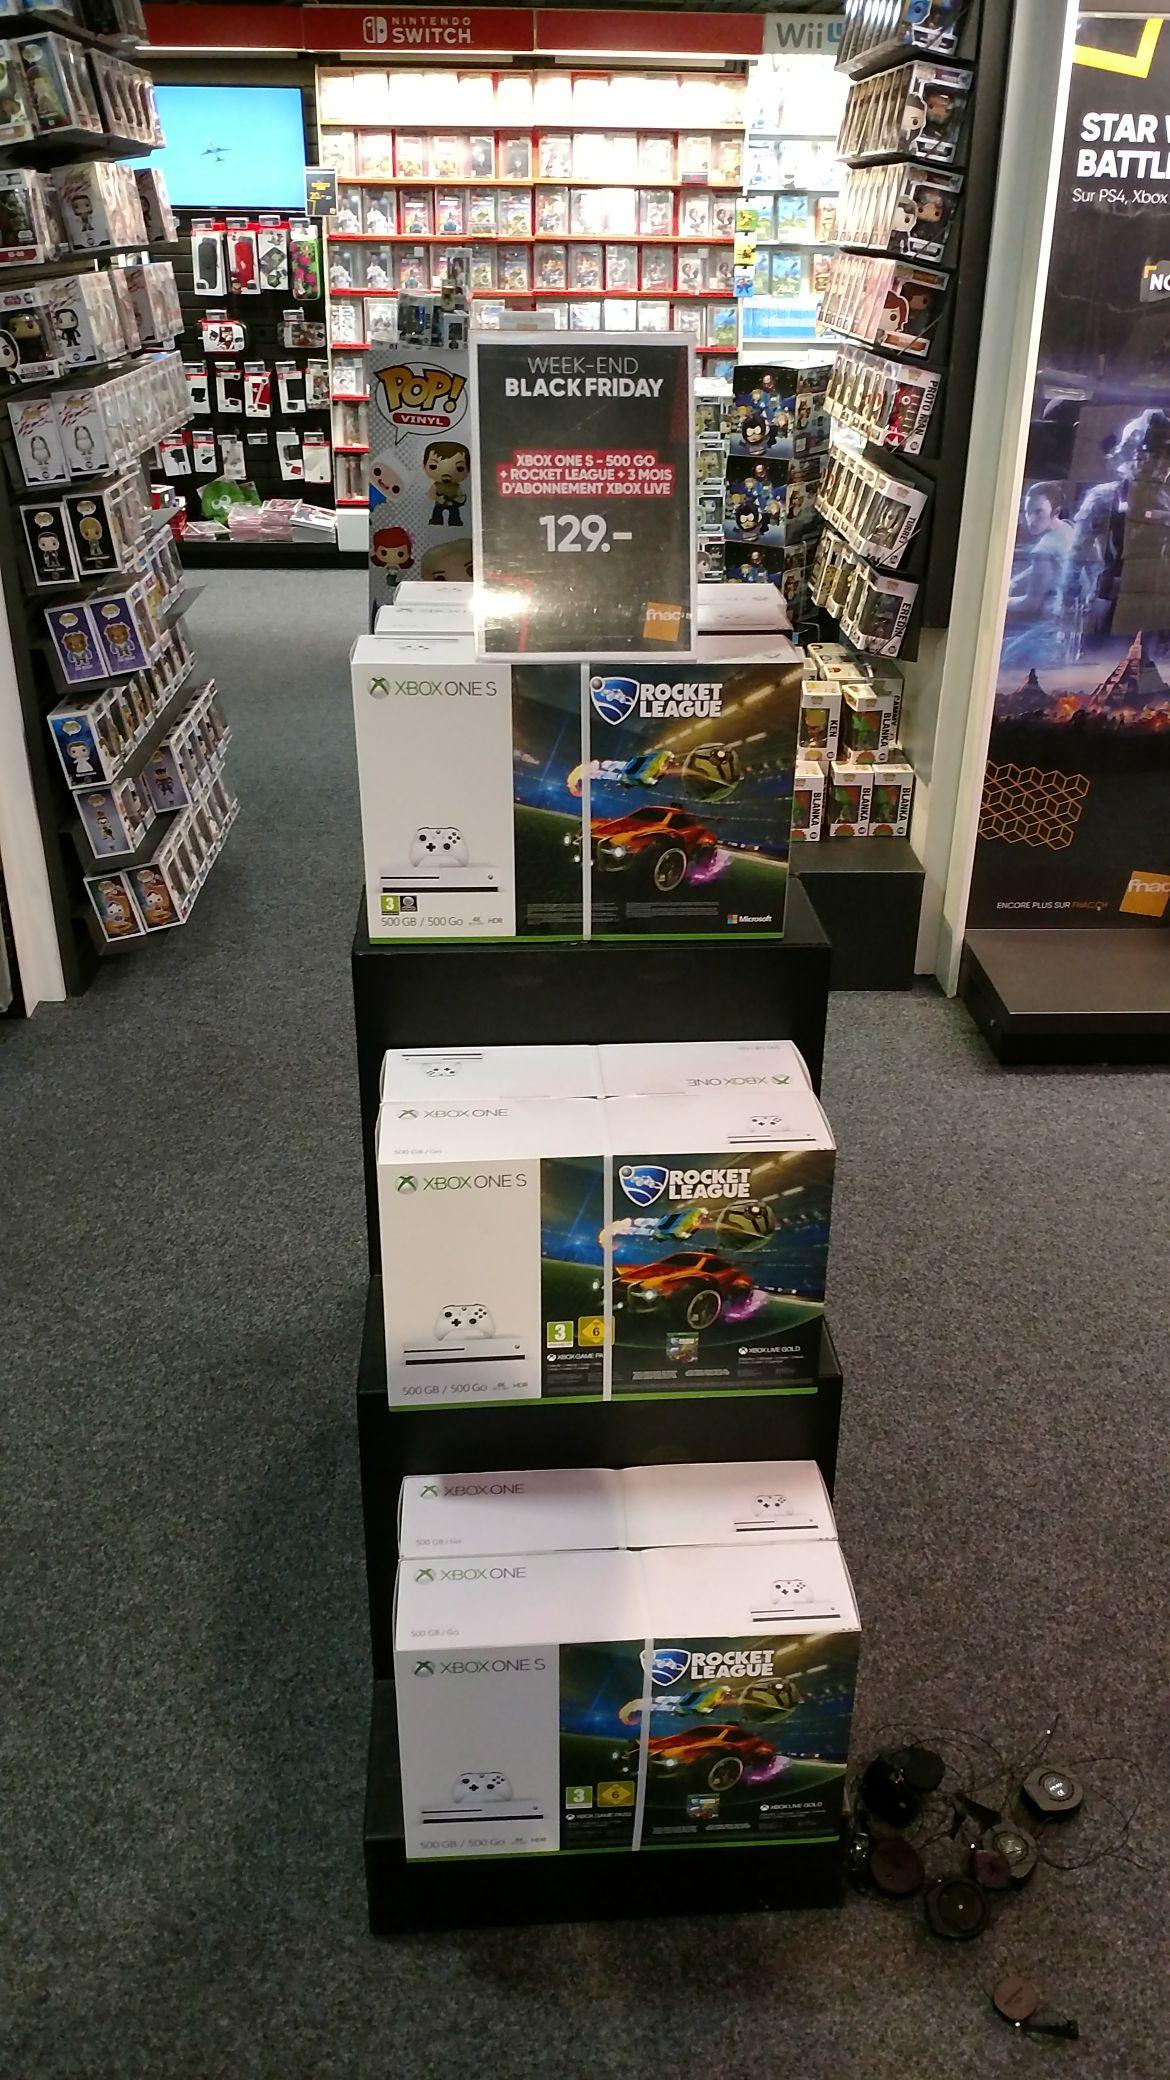 Console Microsoft Xbox One S 500 Go + Rocket League + 3 mois Xbox live - Genève (Frontaliers Suisse)